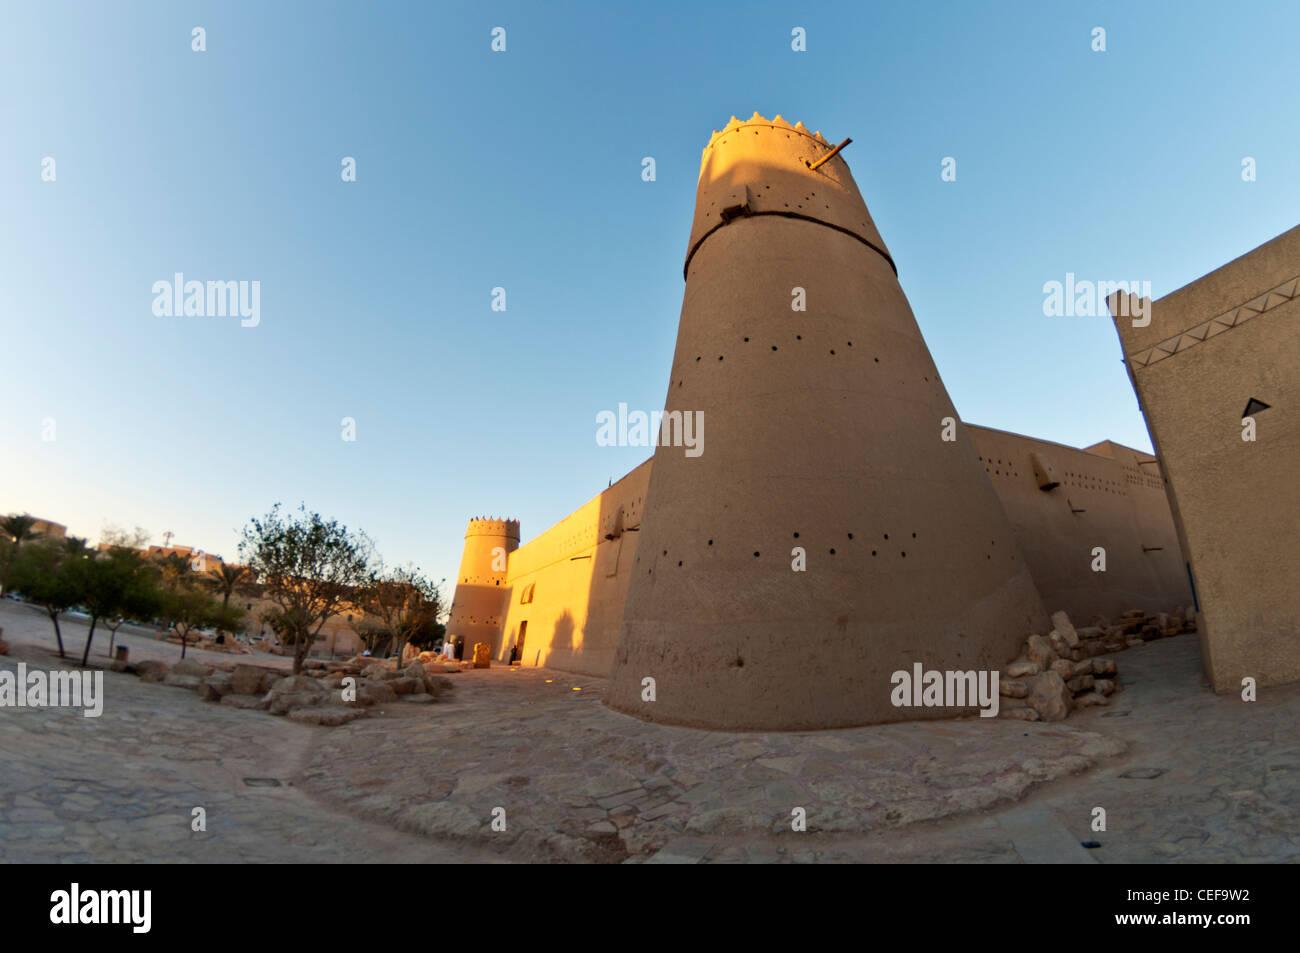 Fort muros de Al-Masmak fort, en Riad, Arabia Saudita Imagen De Stock